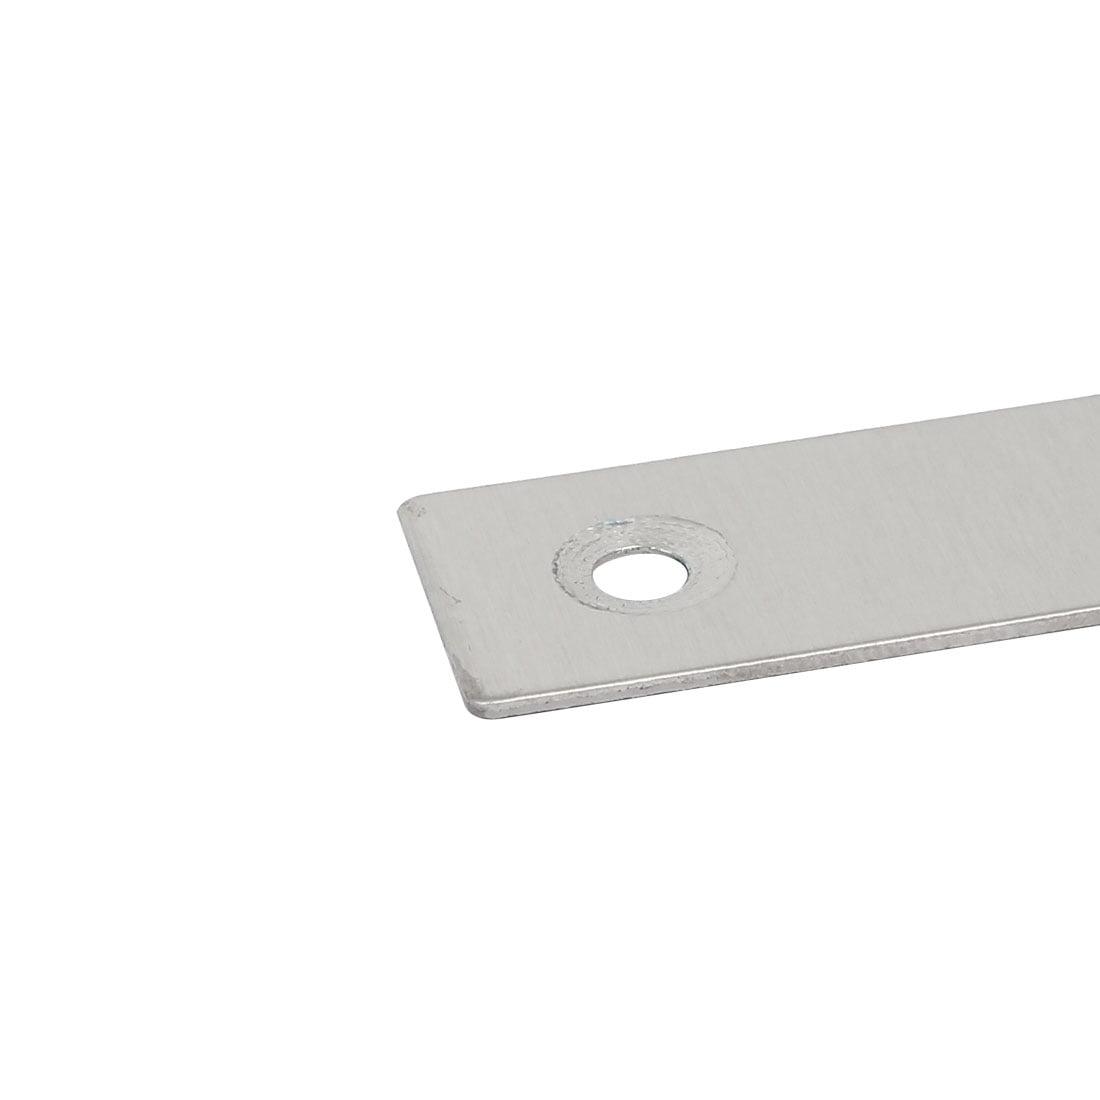 80mmx80mmx1mm Metal T Shaped Flat Repair Plates Corner Brace Bracket 10pcs - image 1 de 3